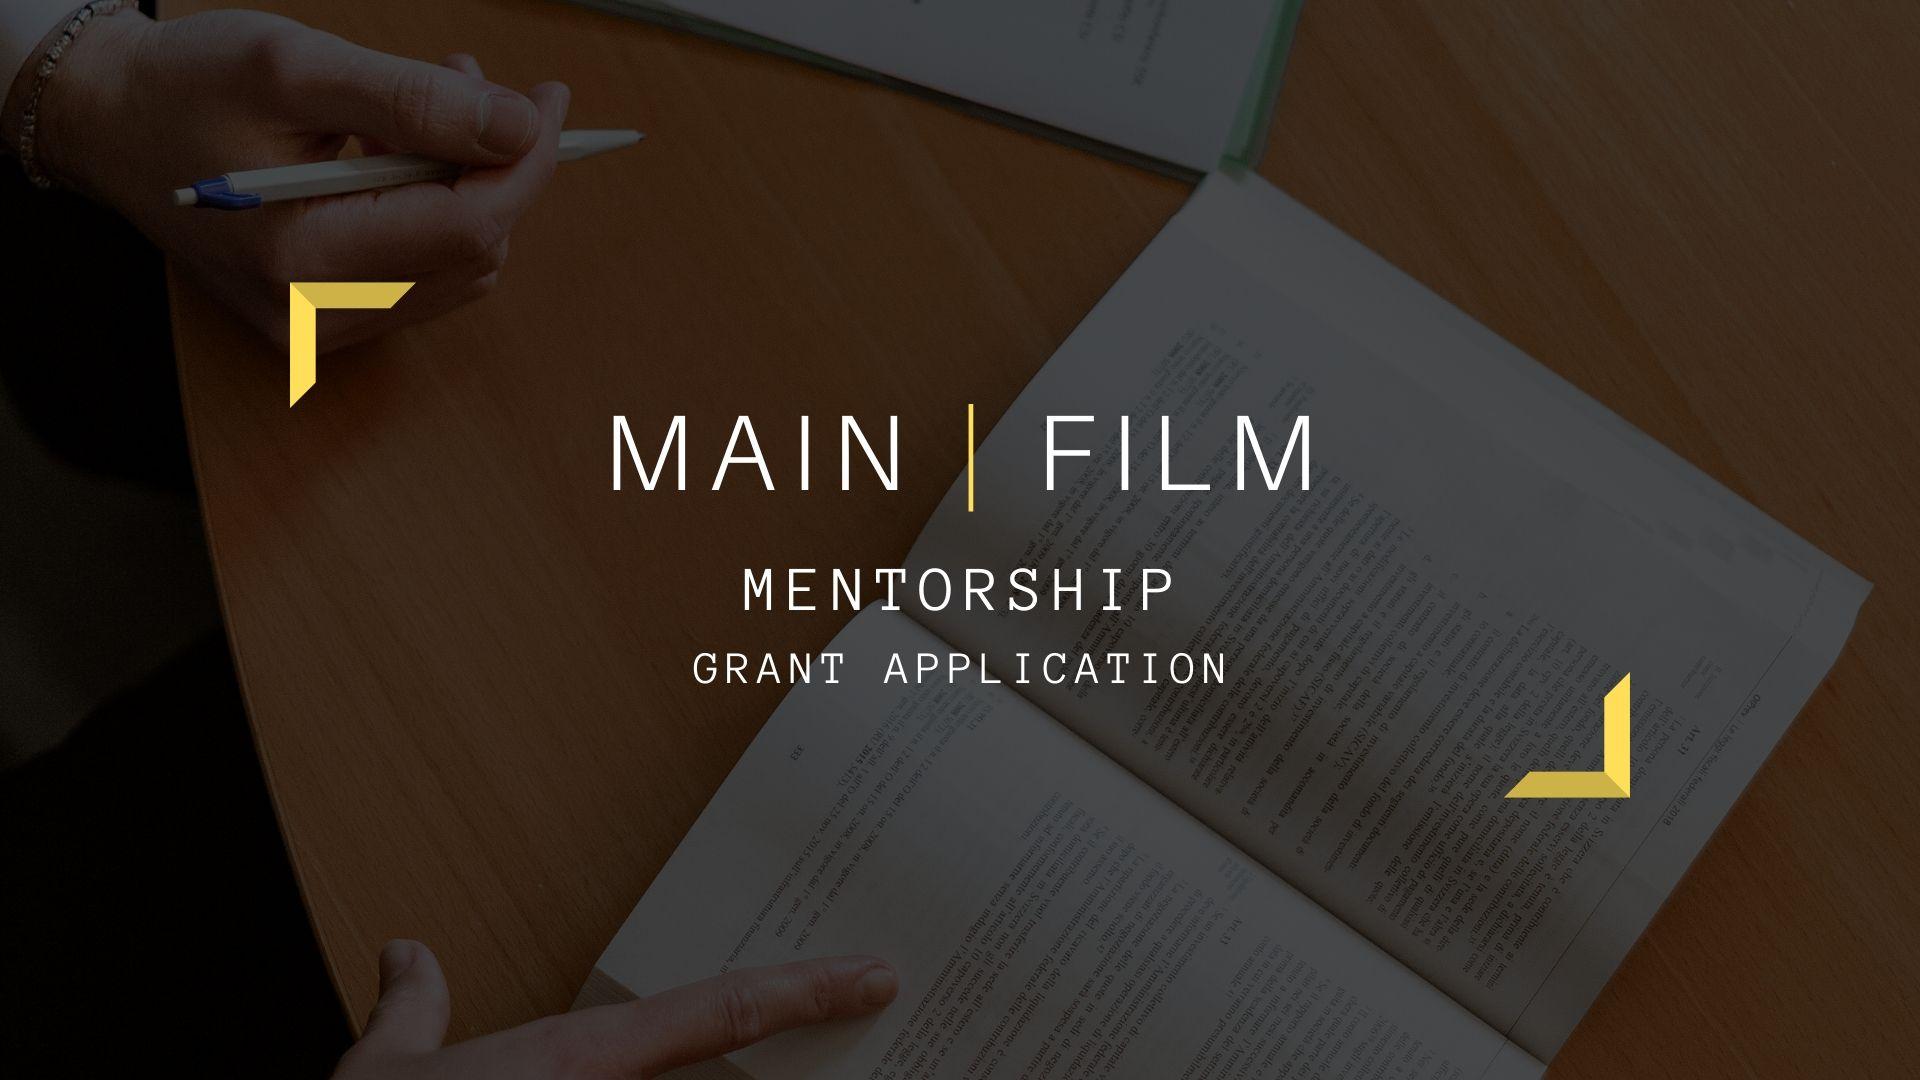 Mentorship for grant application